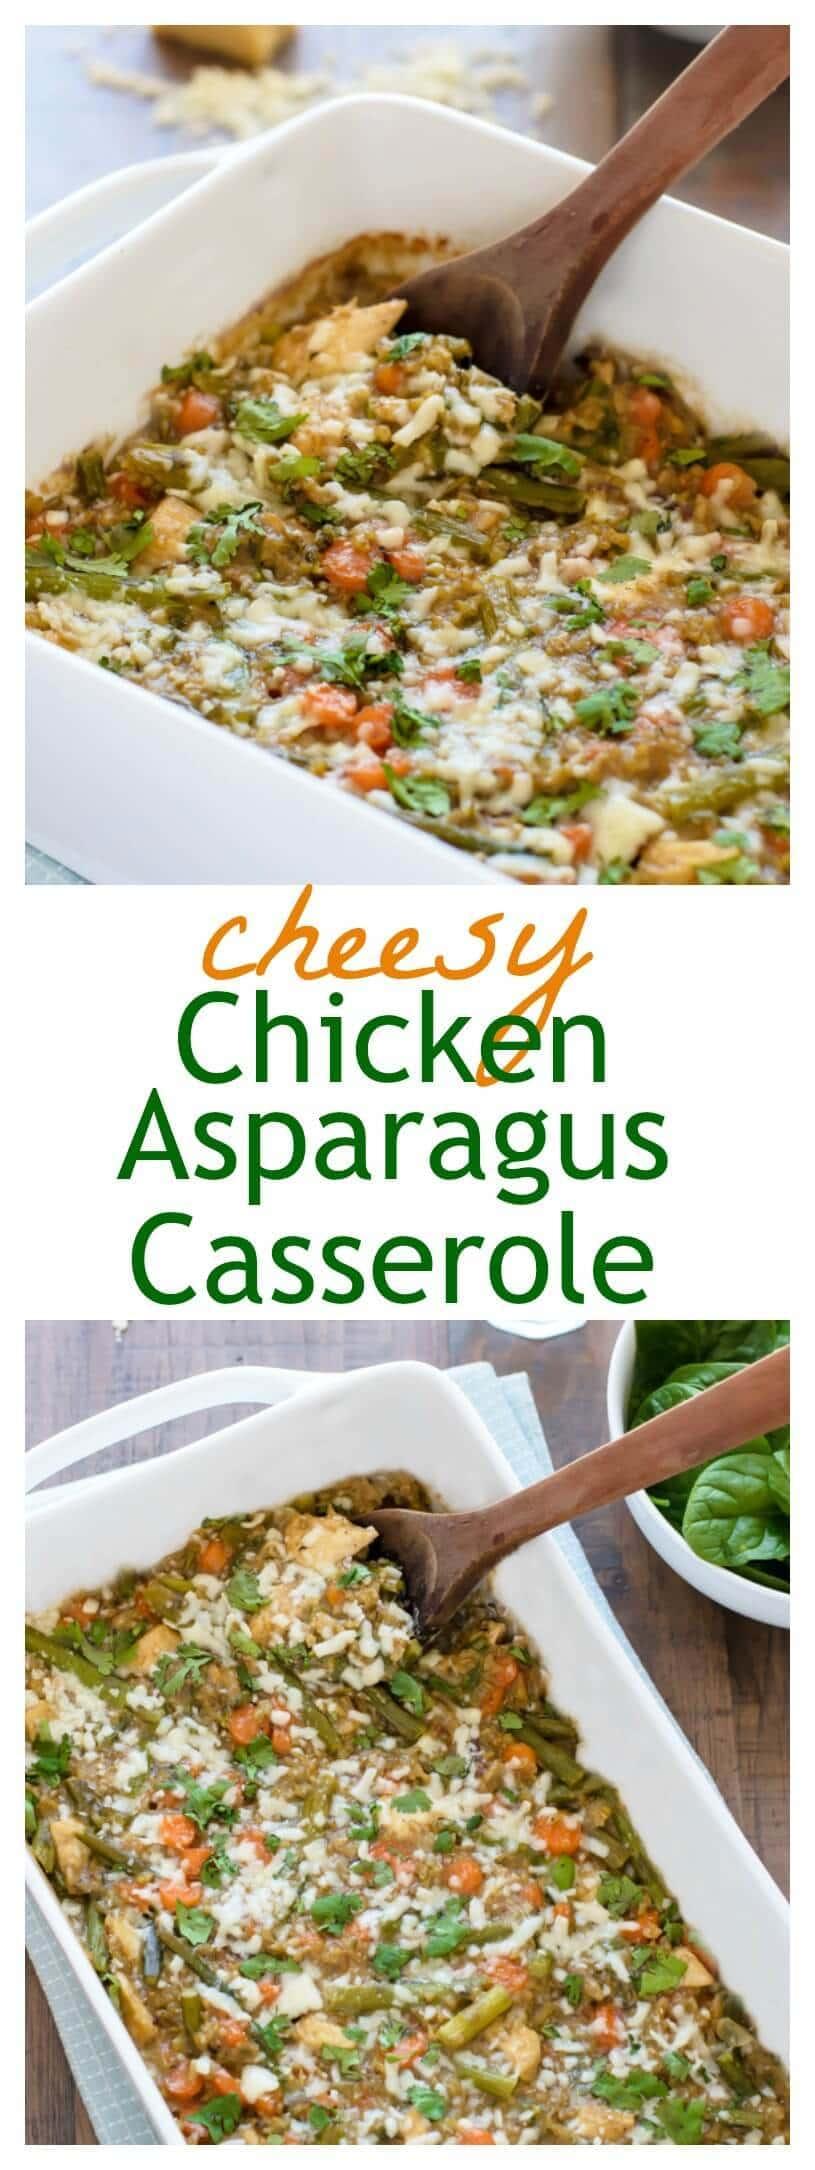 Cheesy Chicken Asparagus Casserole. Healthy and freezer friendly!